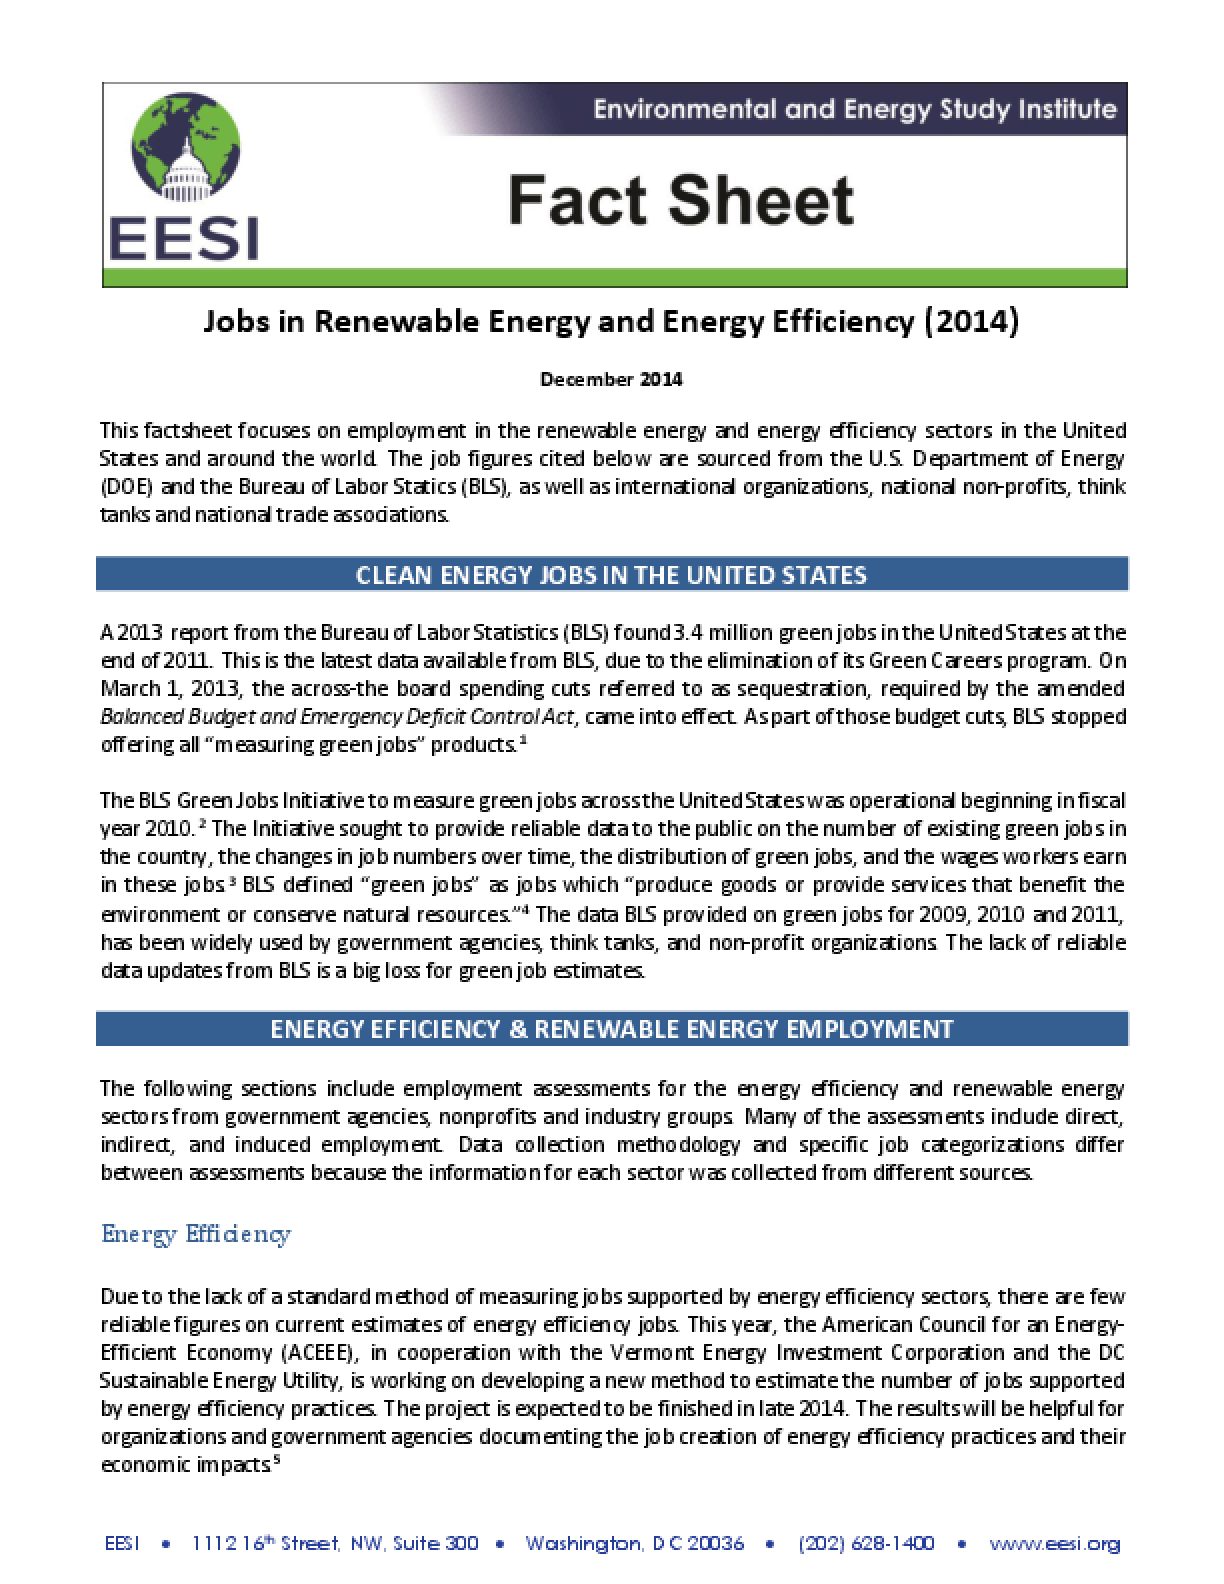 Fact Sheet: Jobs in Renewable Energy and Energy Efficiency (2014)